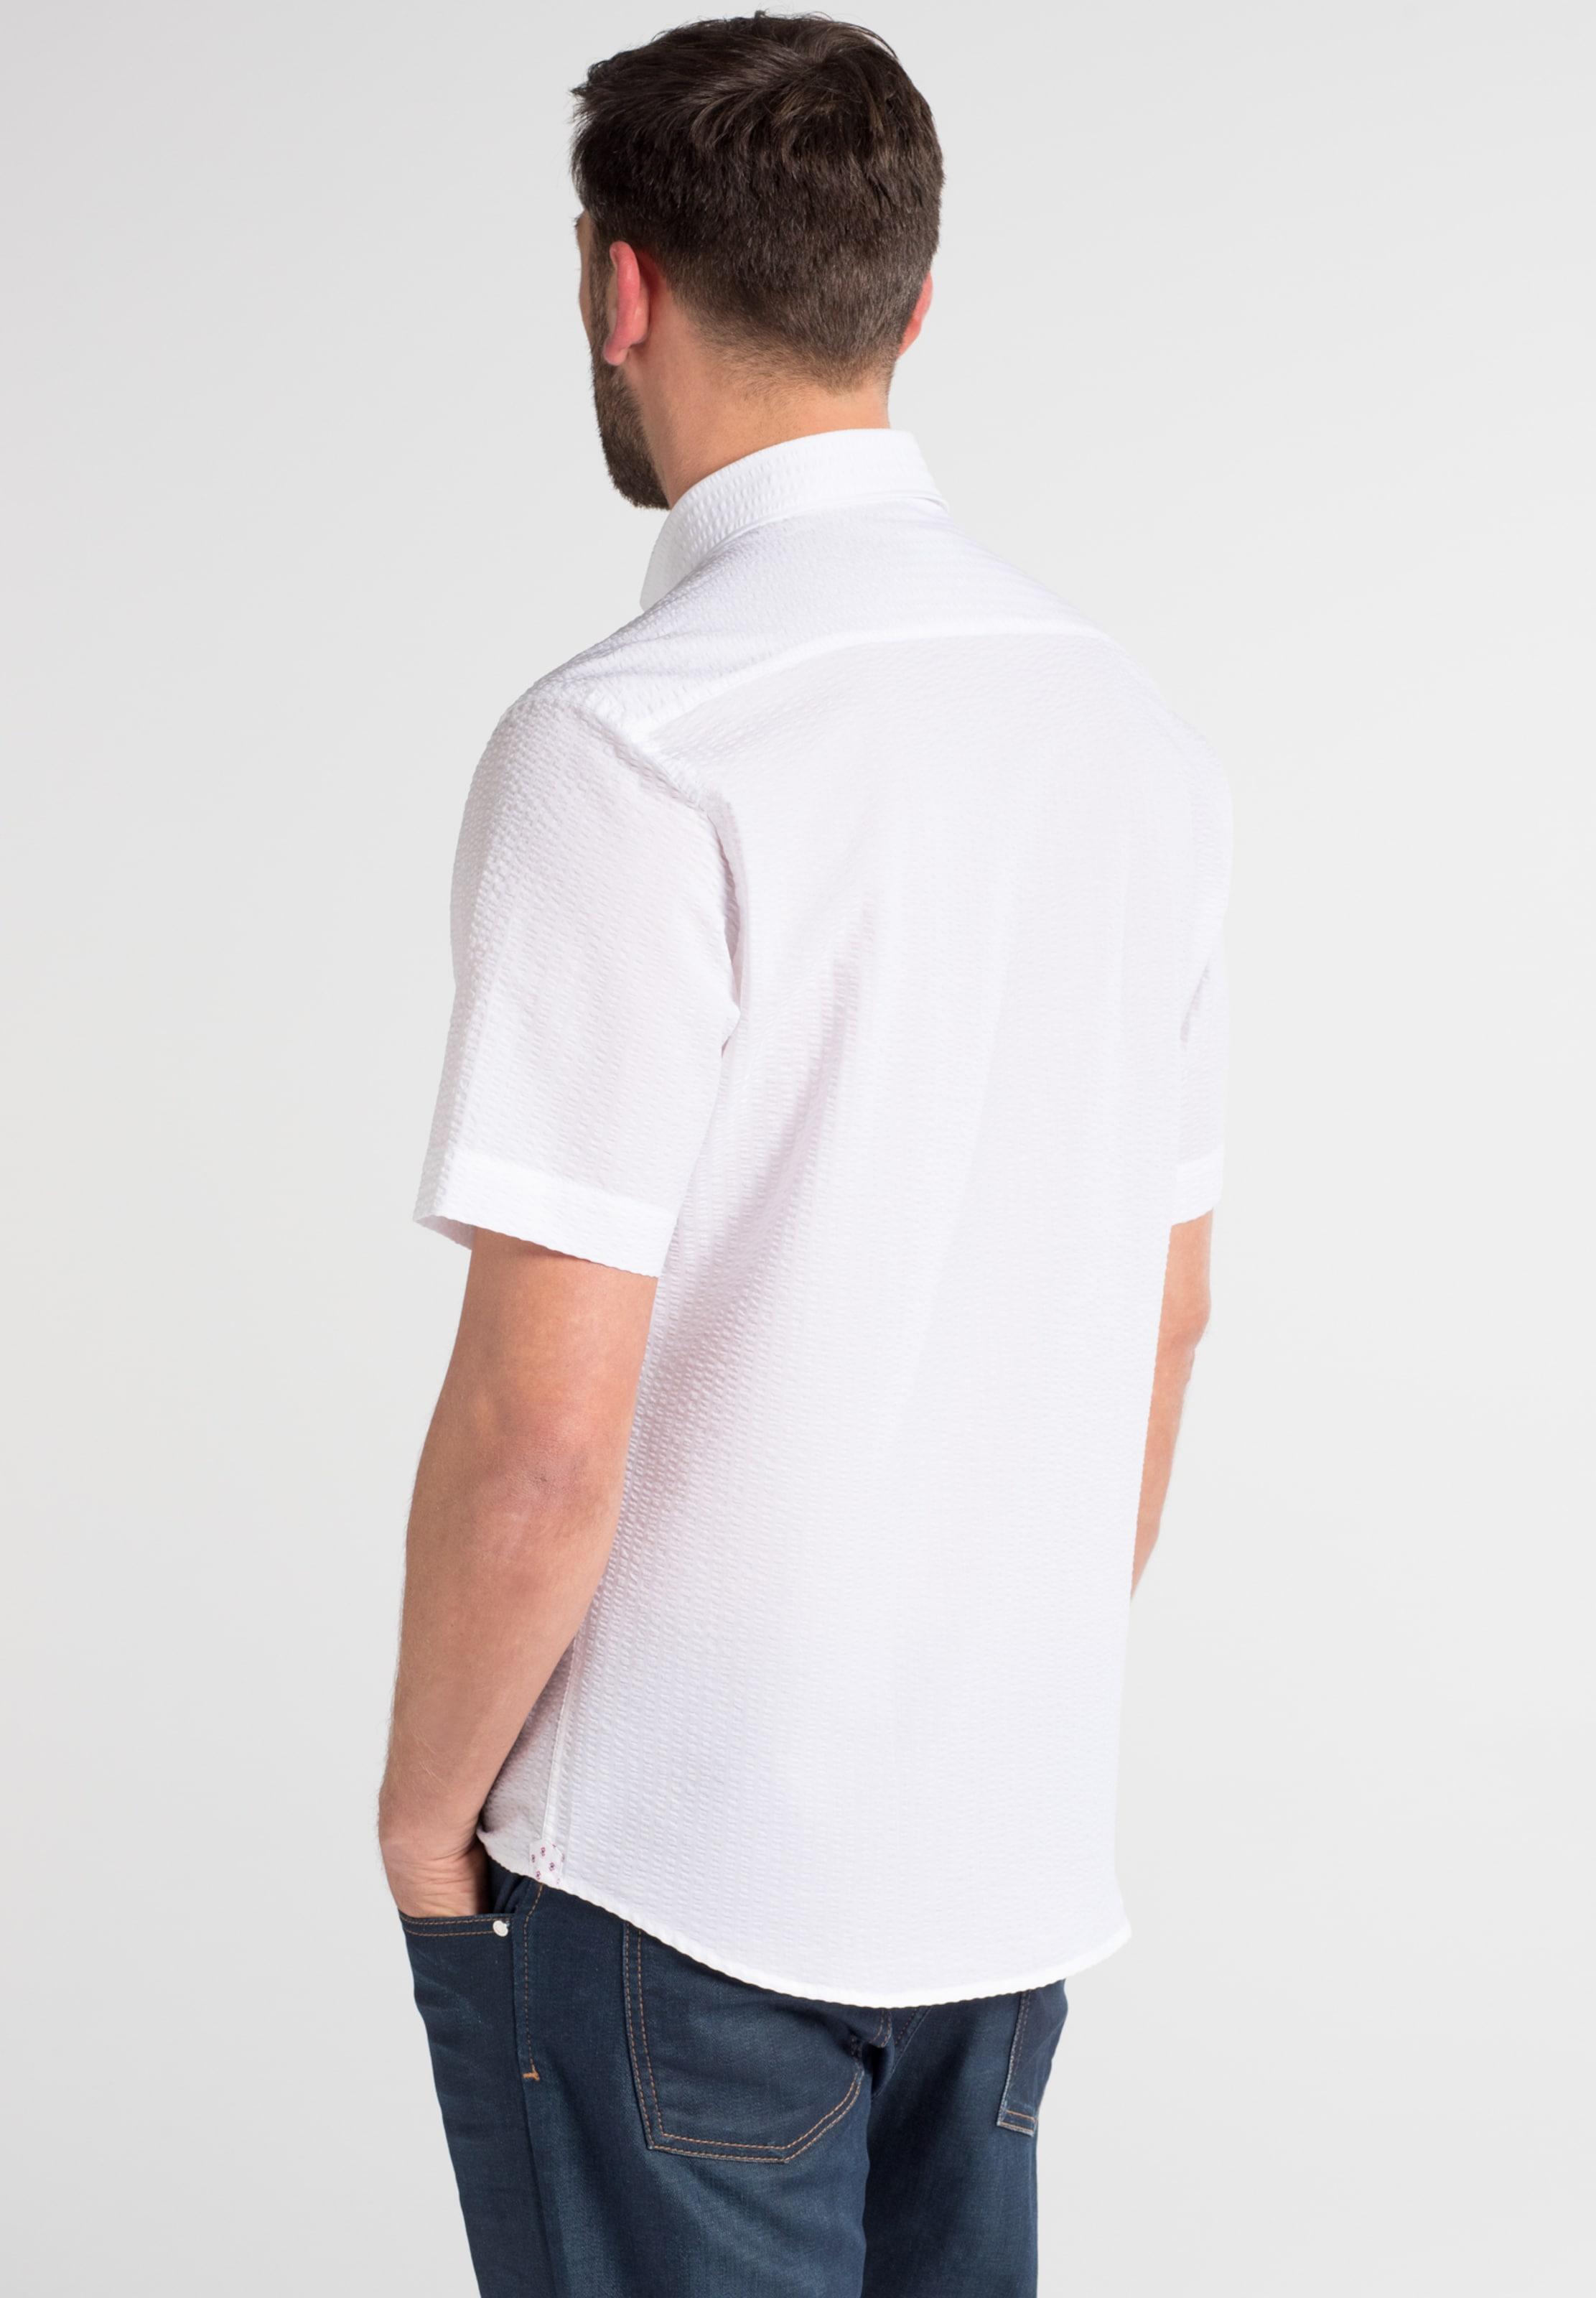 Eterna Eterna Weiß Weiß Eterna In In Hemd Hemd In Hemd Eterna Weiß EeIbWH29DY